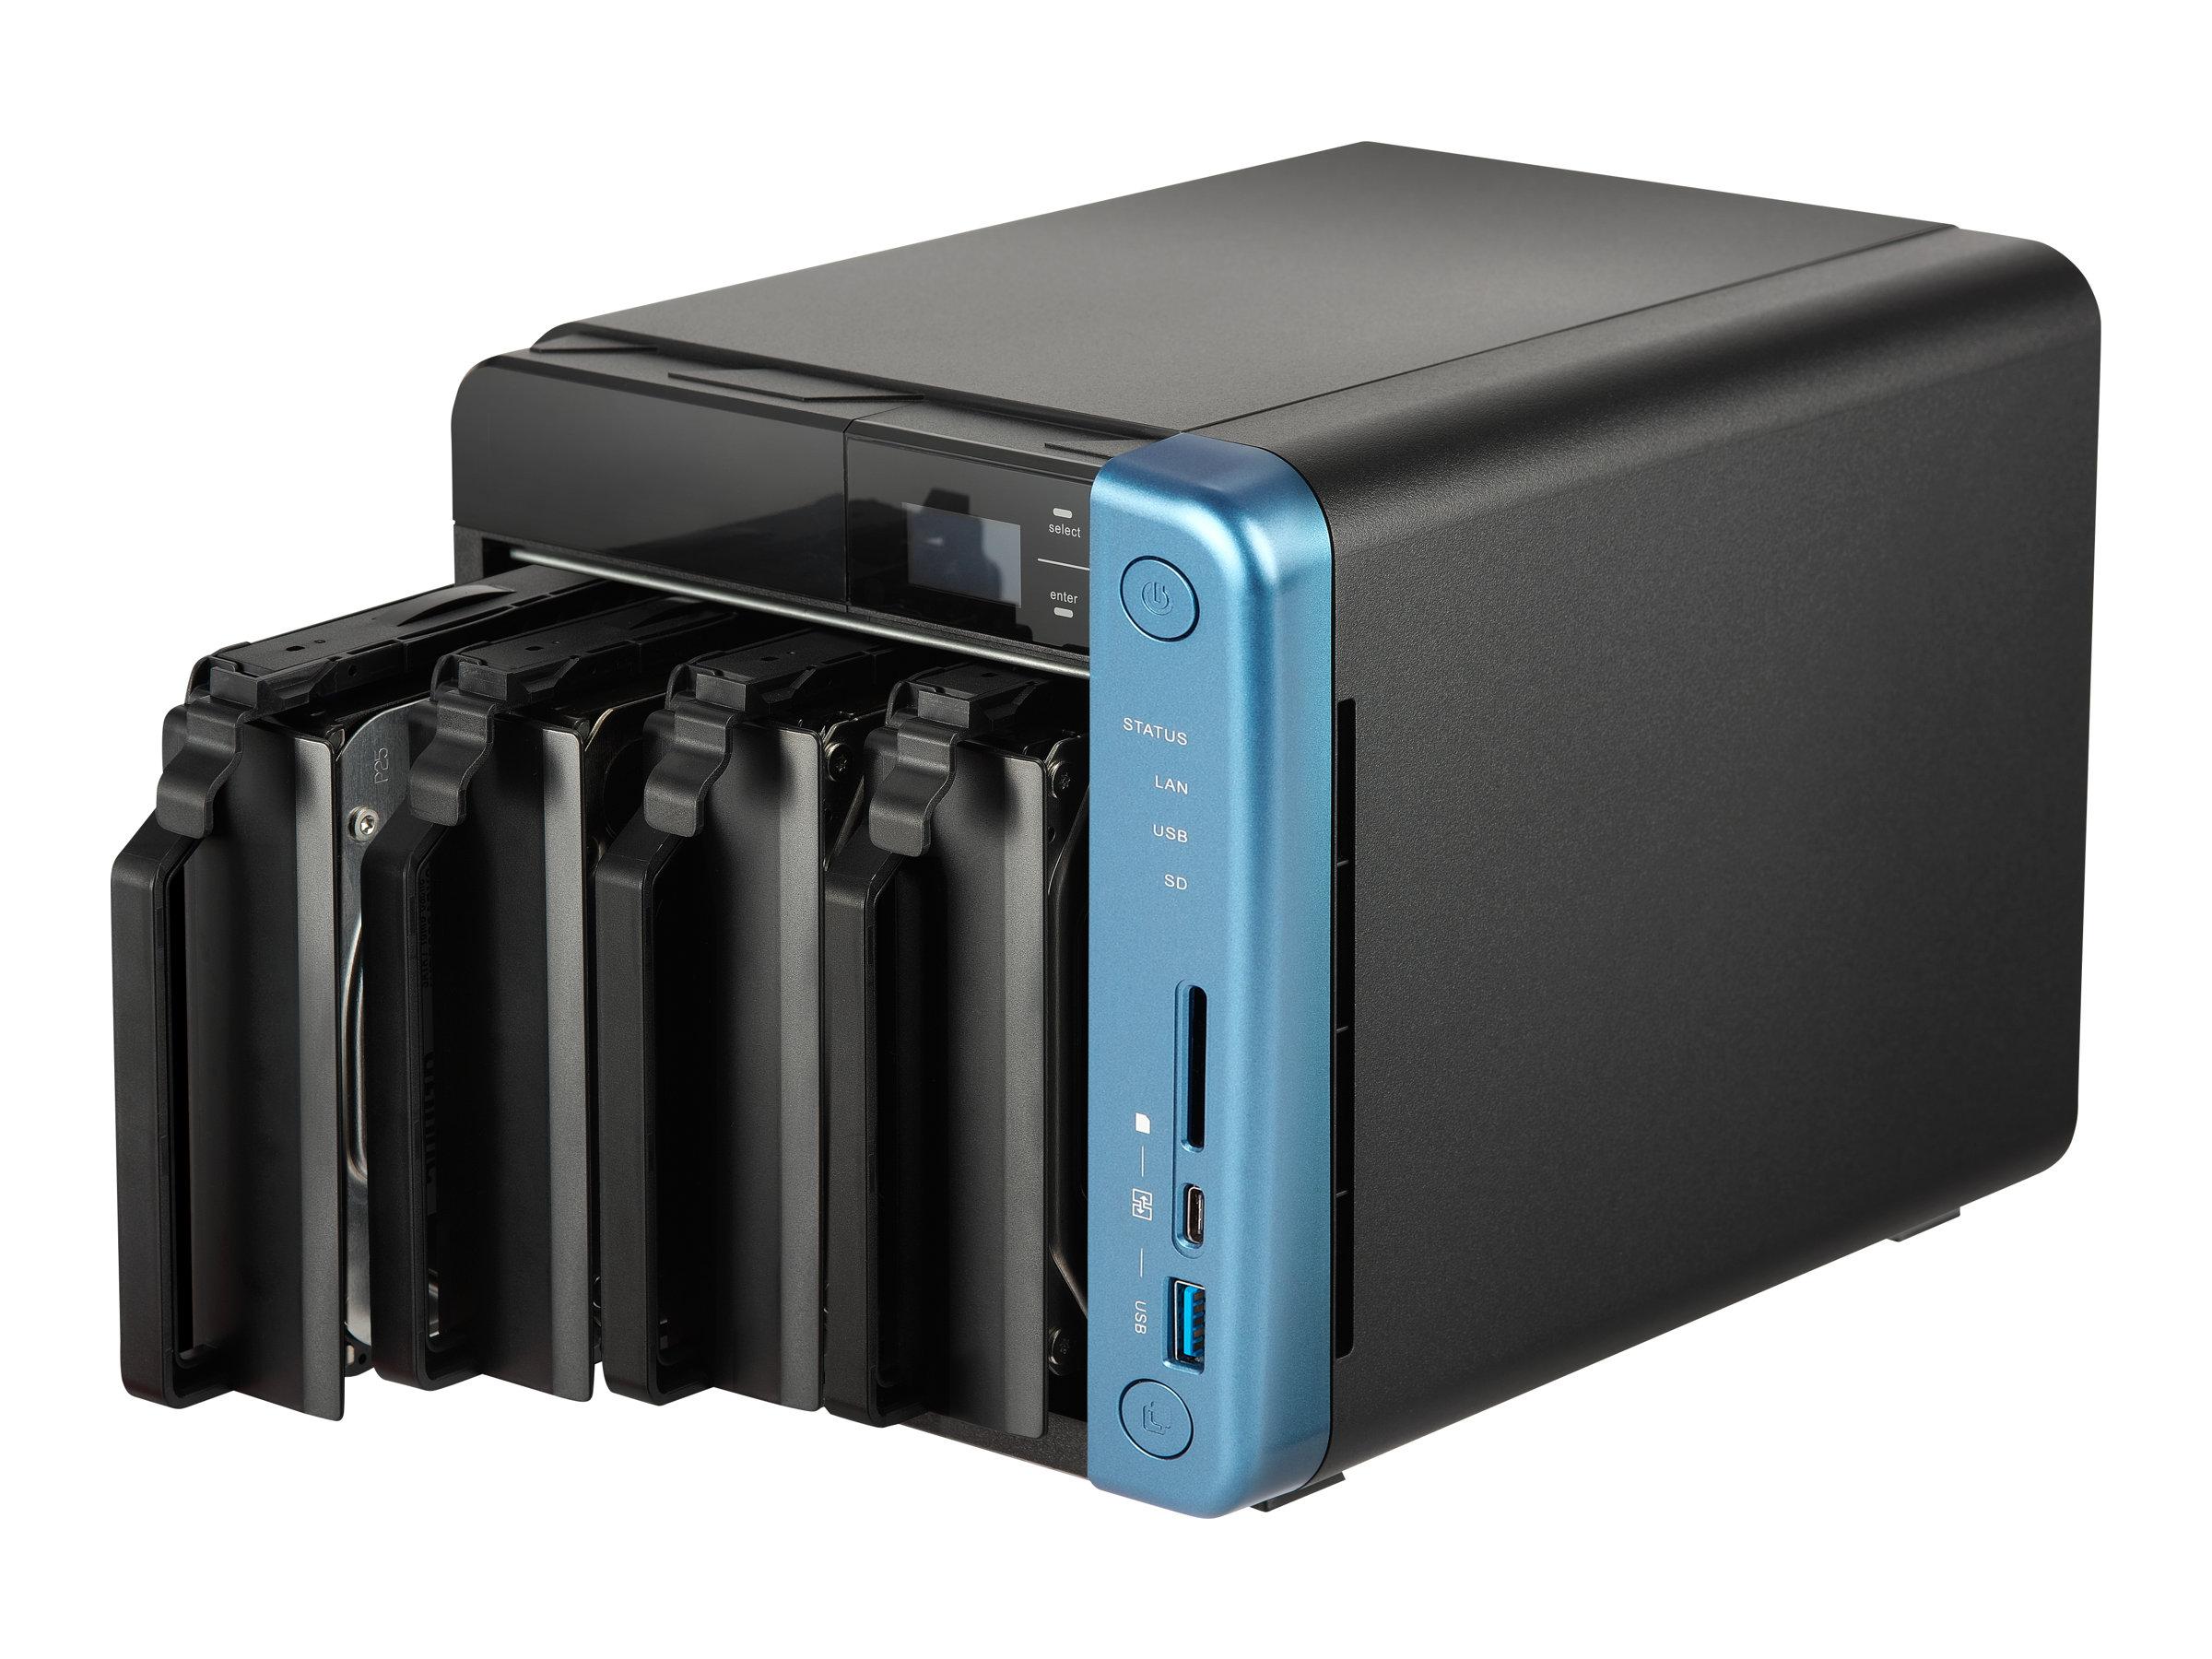 QNAP TS-453B - NAS-Server - 4 Schächte - SATA 6Gb/s - RAM 8 GB - Gigabit Ethernet